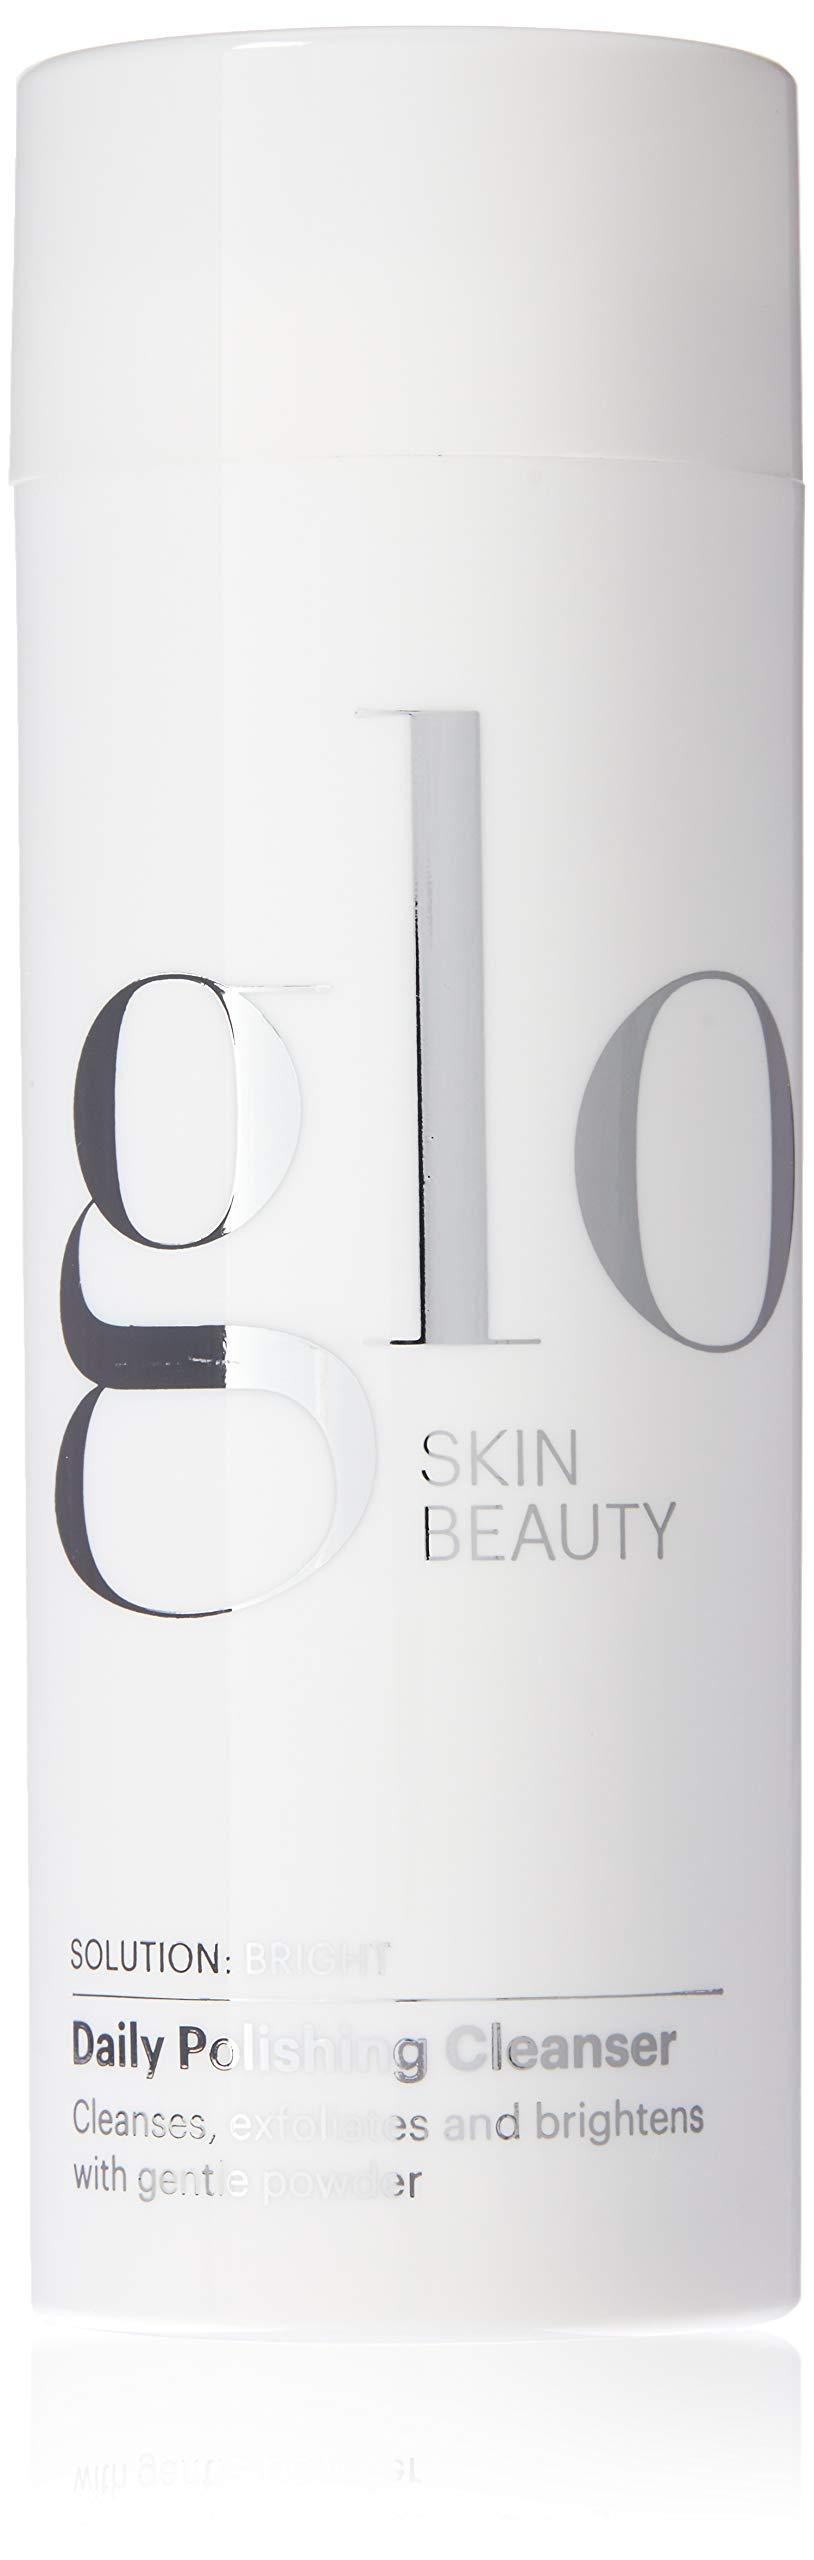 Glo Skin Beauty Exfoliating Powder Face Wash | Daily Polishing Cleanser | Environmentally-Friendly